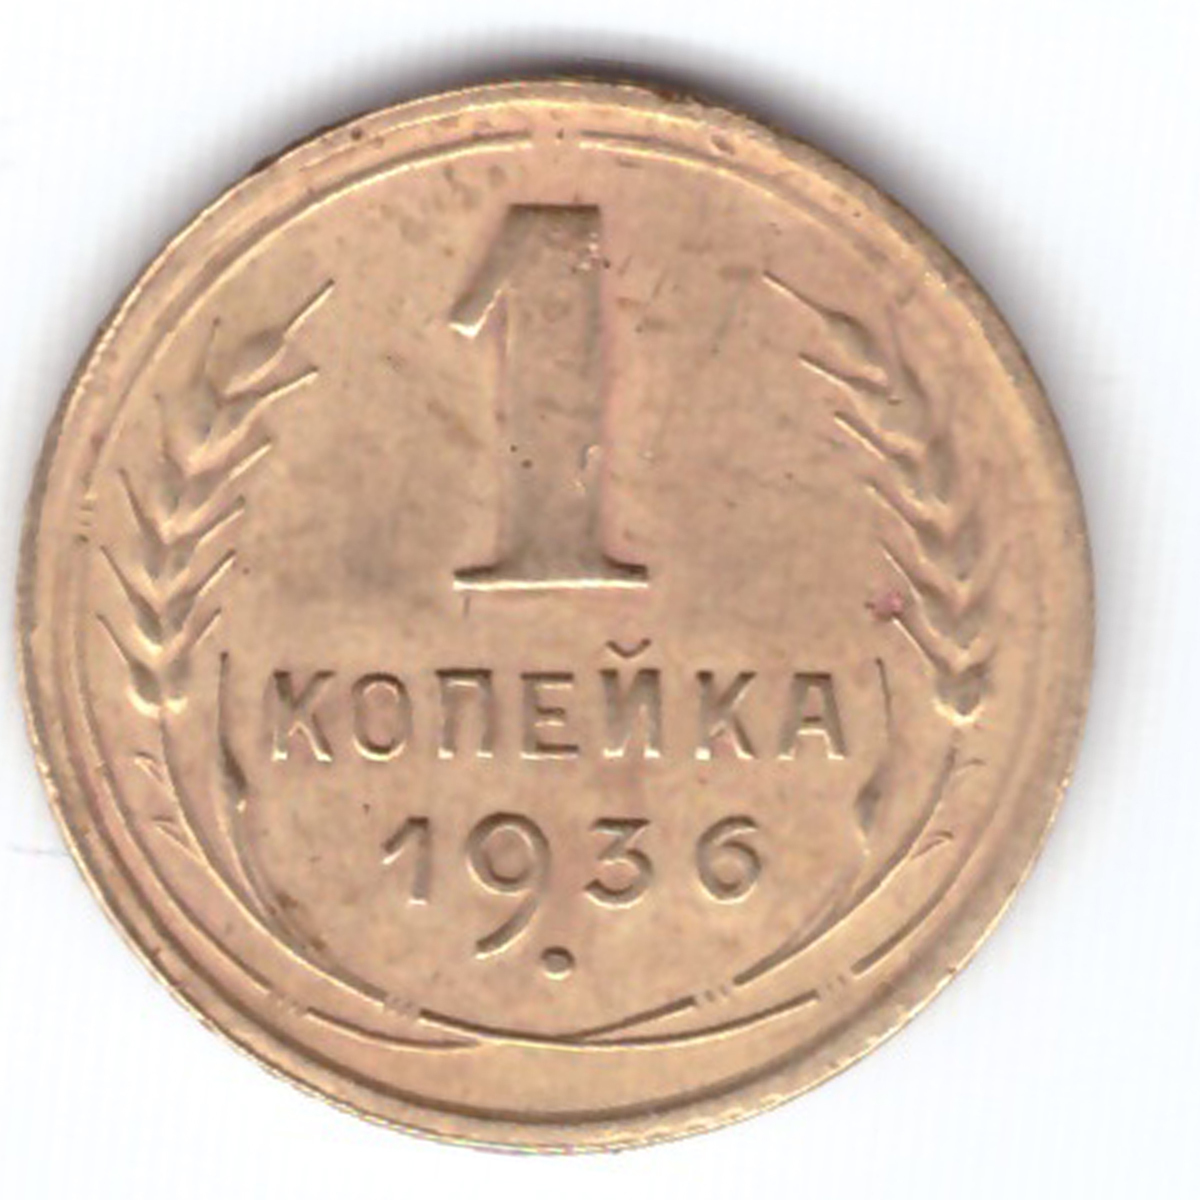 1 копейка 1936 V F